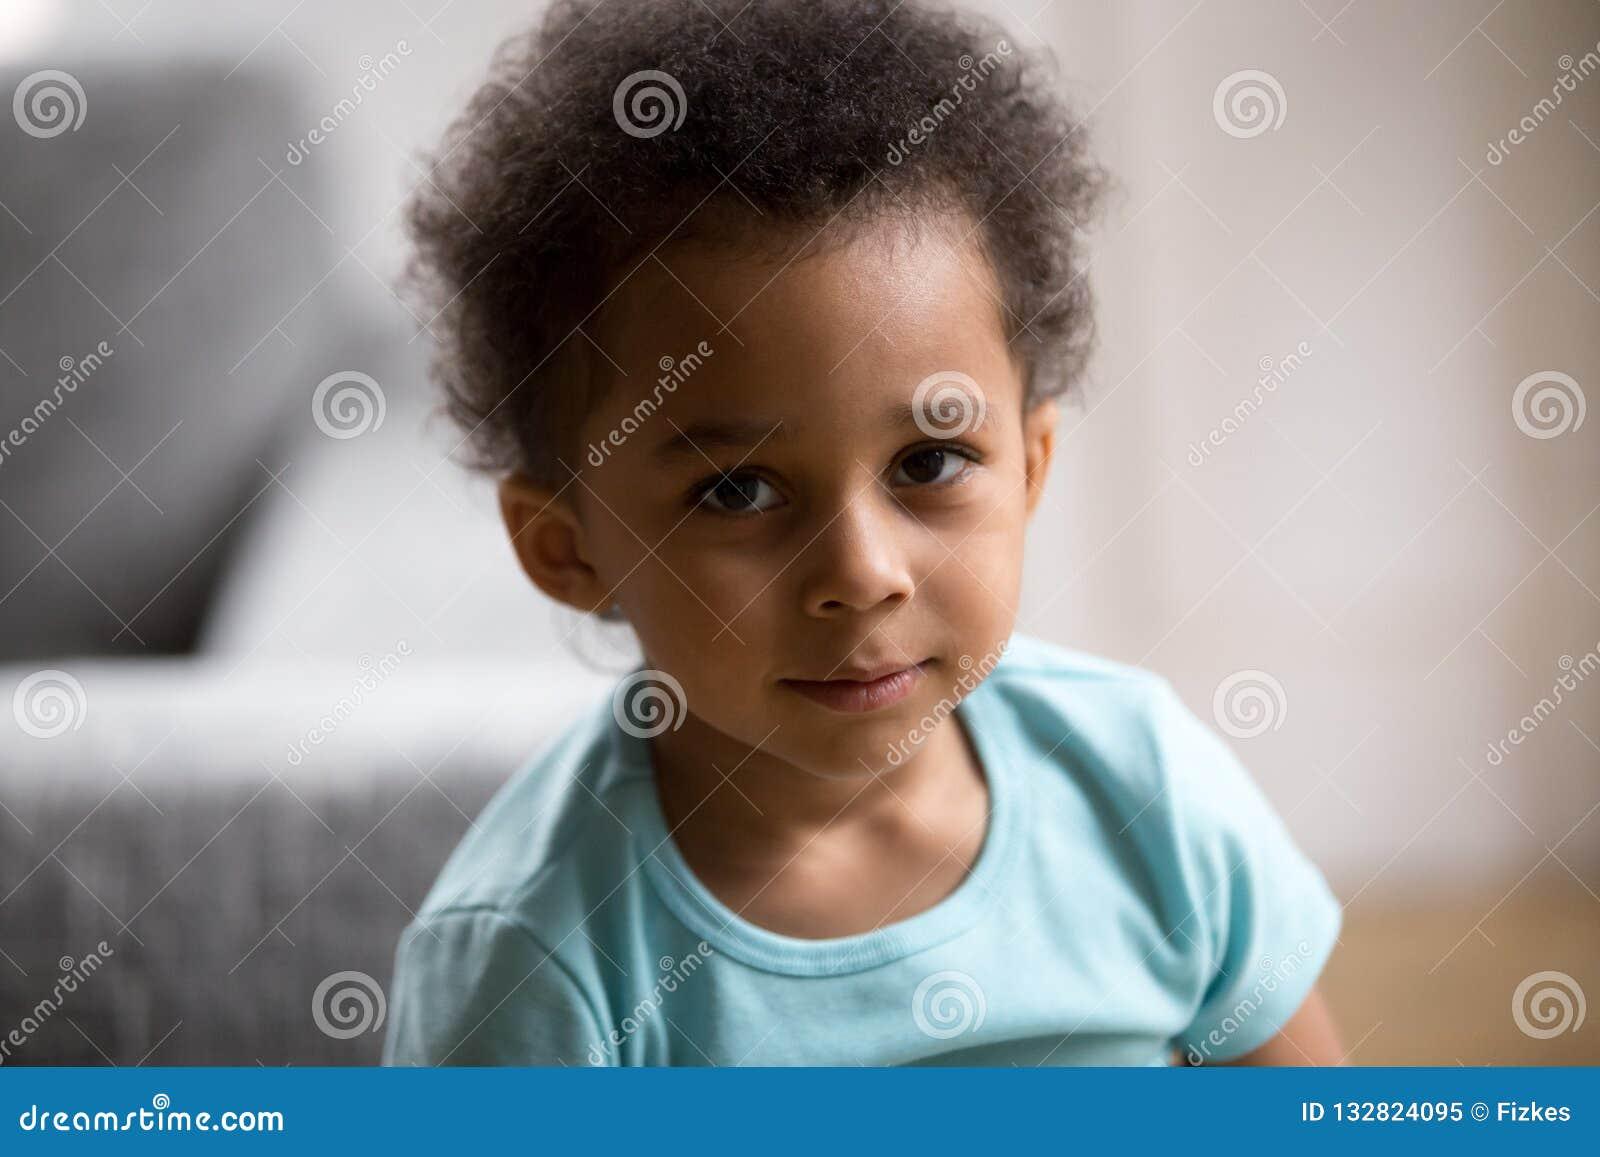 Head shot portrait toddler African American child